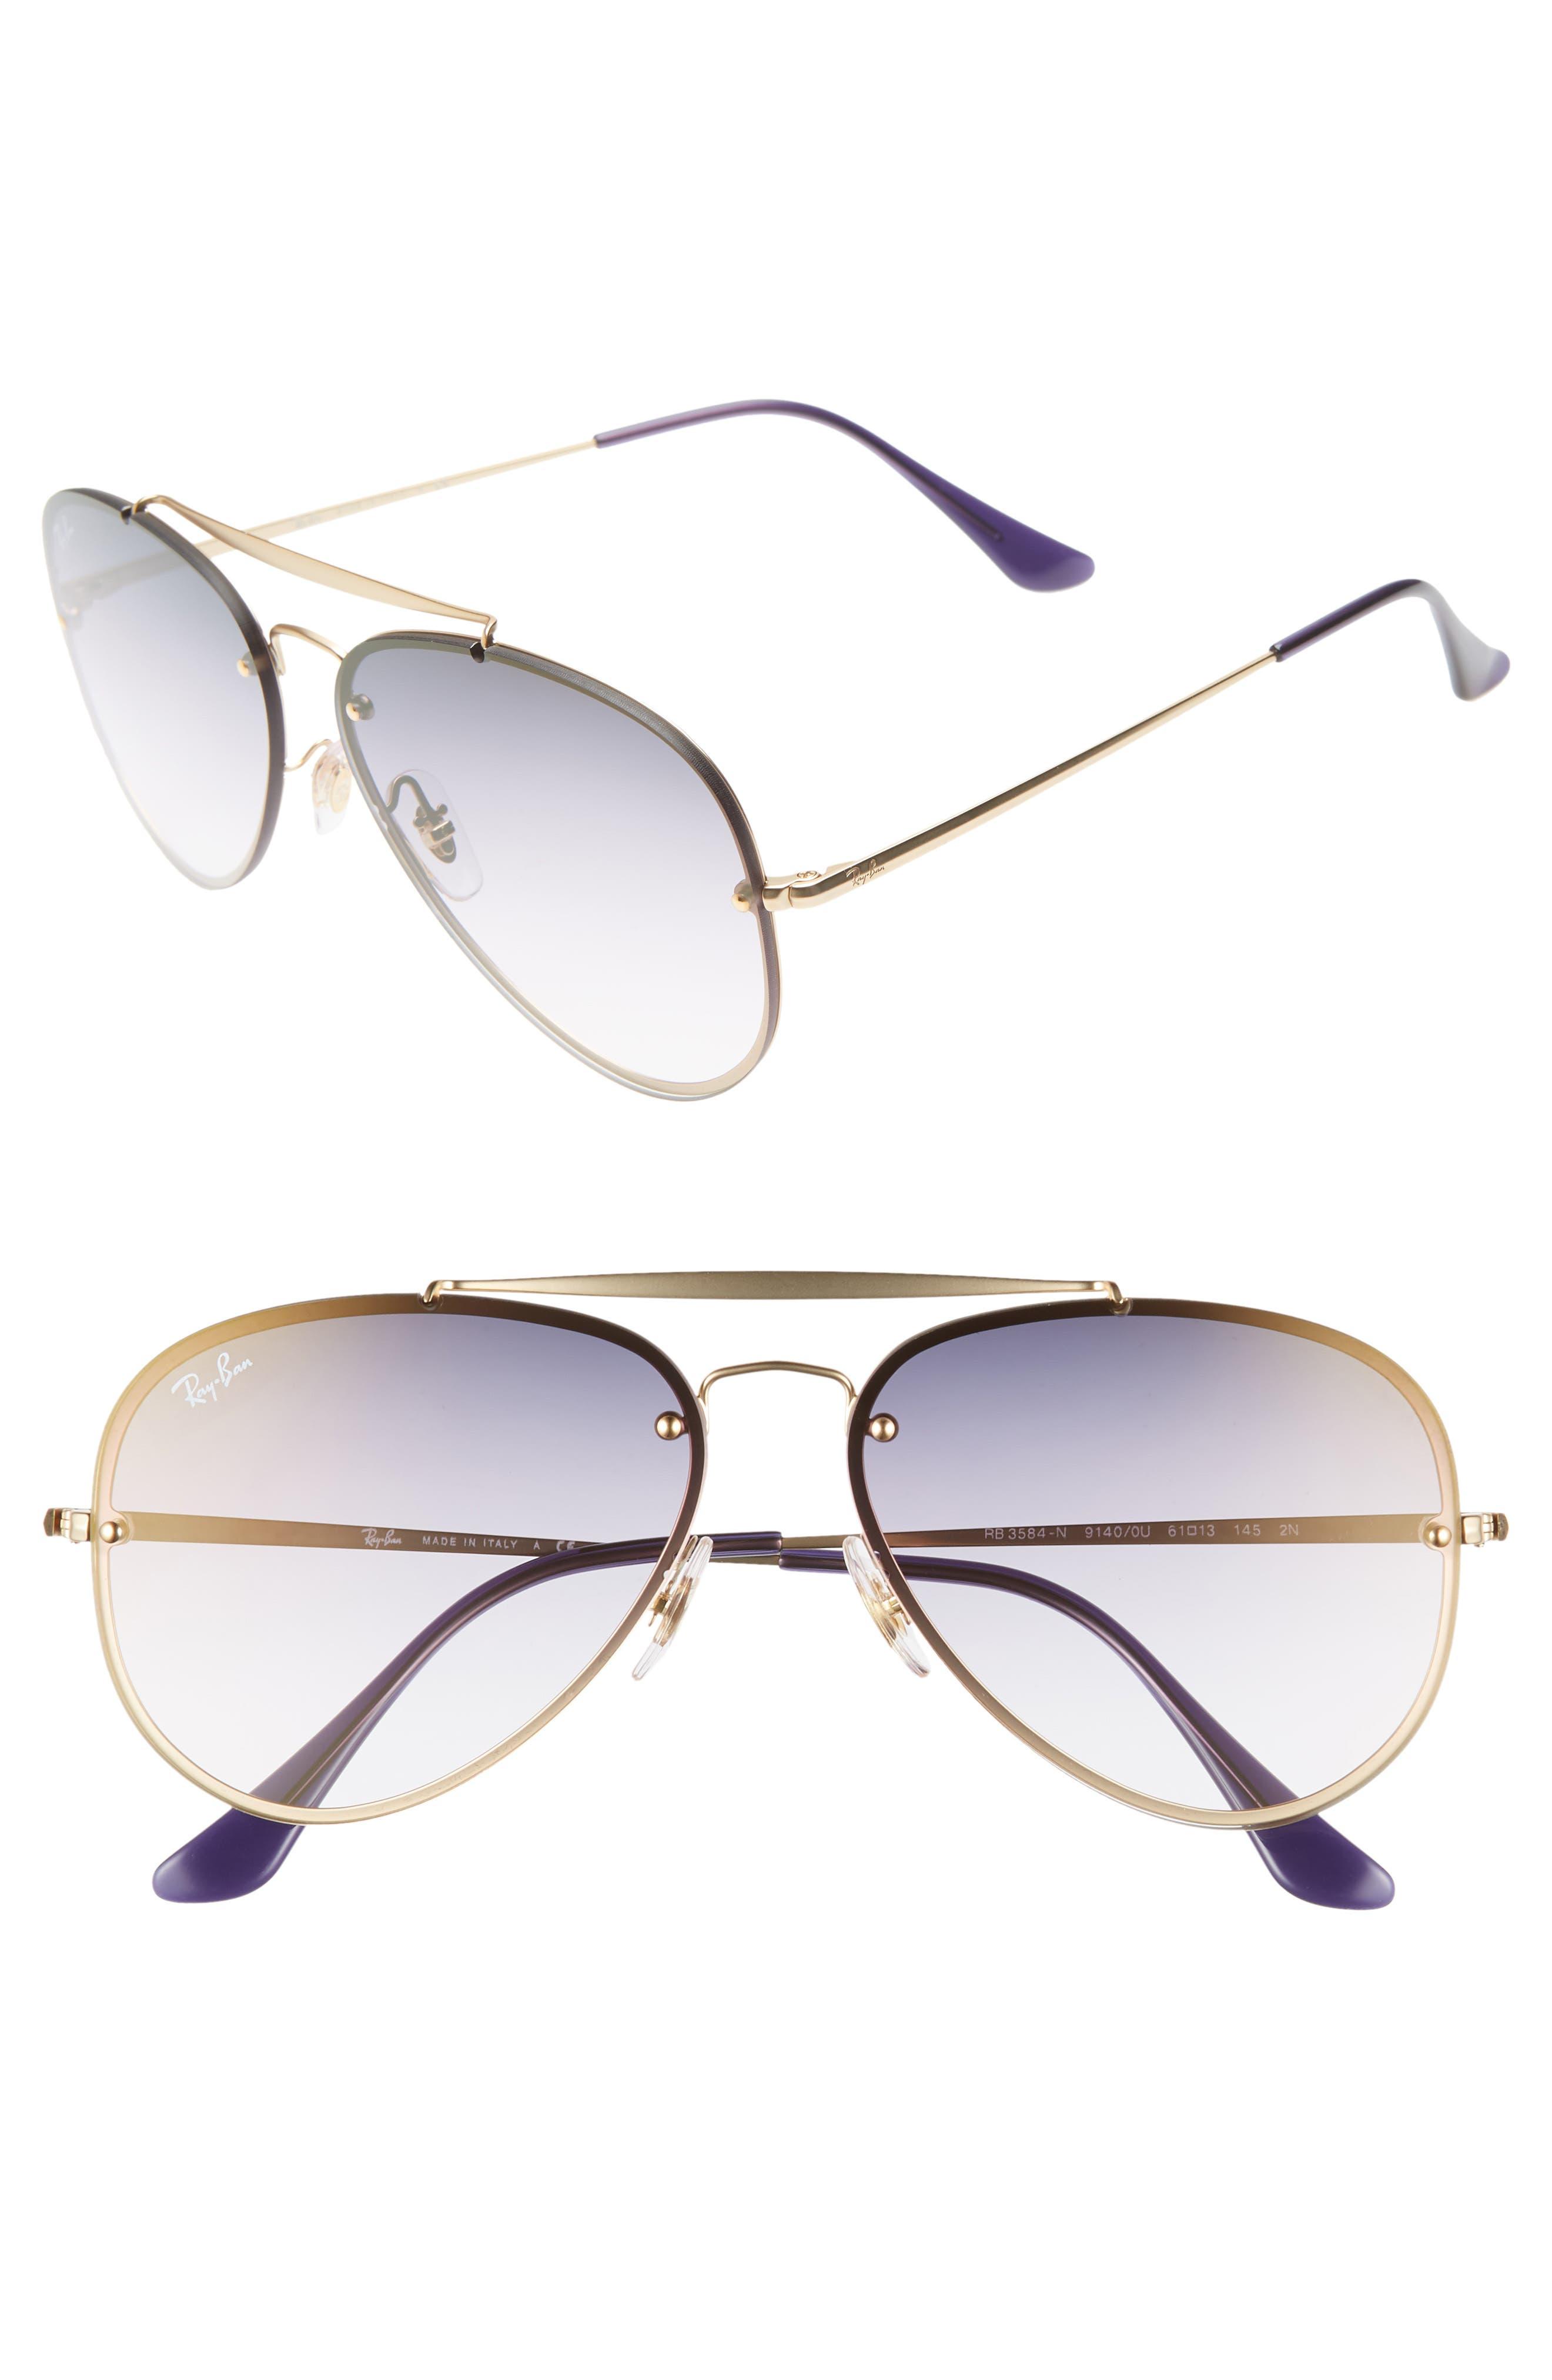 61mm Mirrored Lens Aviator Sunglasses,                             Main thumbnail 1, color,                             GOLD/ BLUE VIOLET GRADIENT